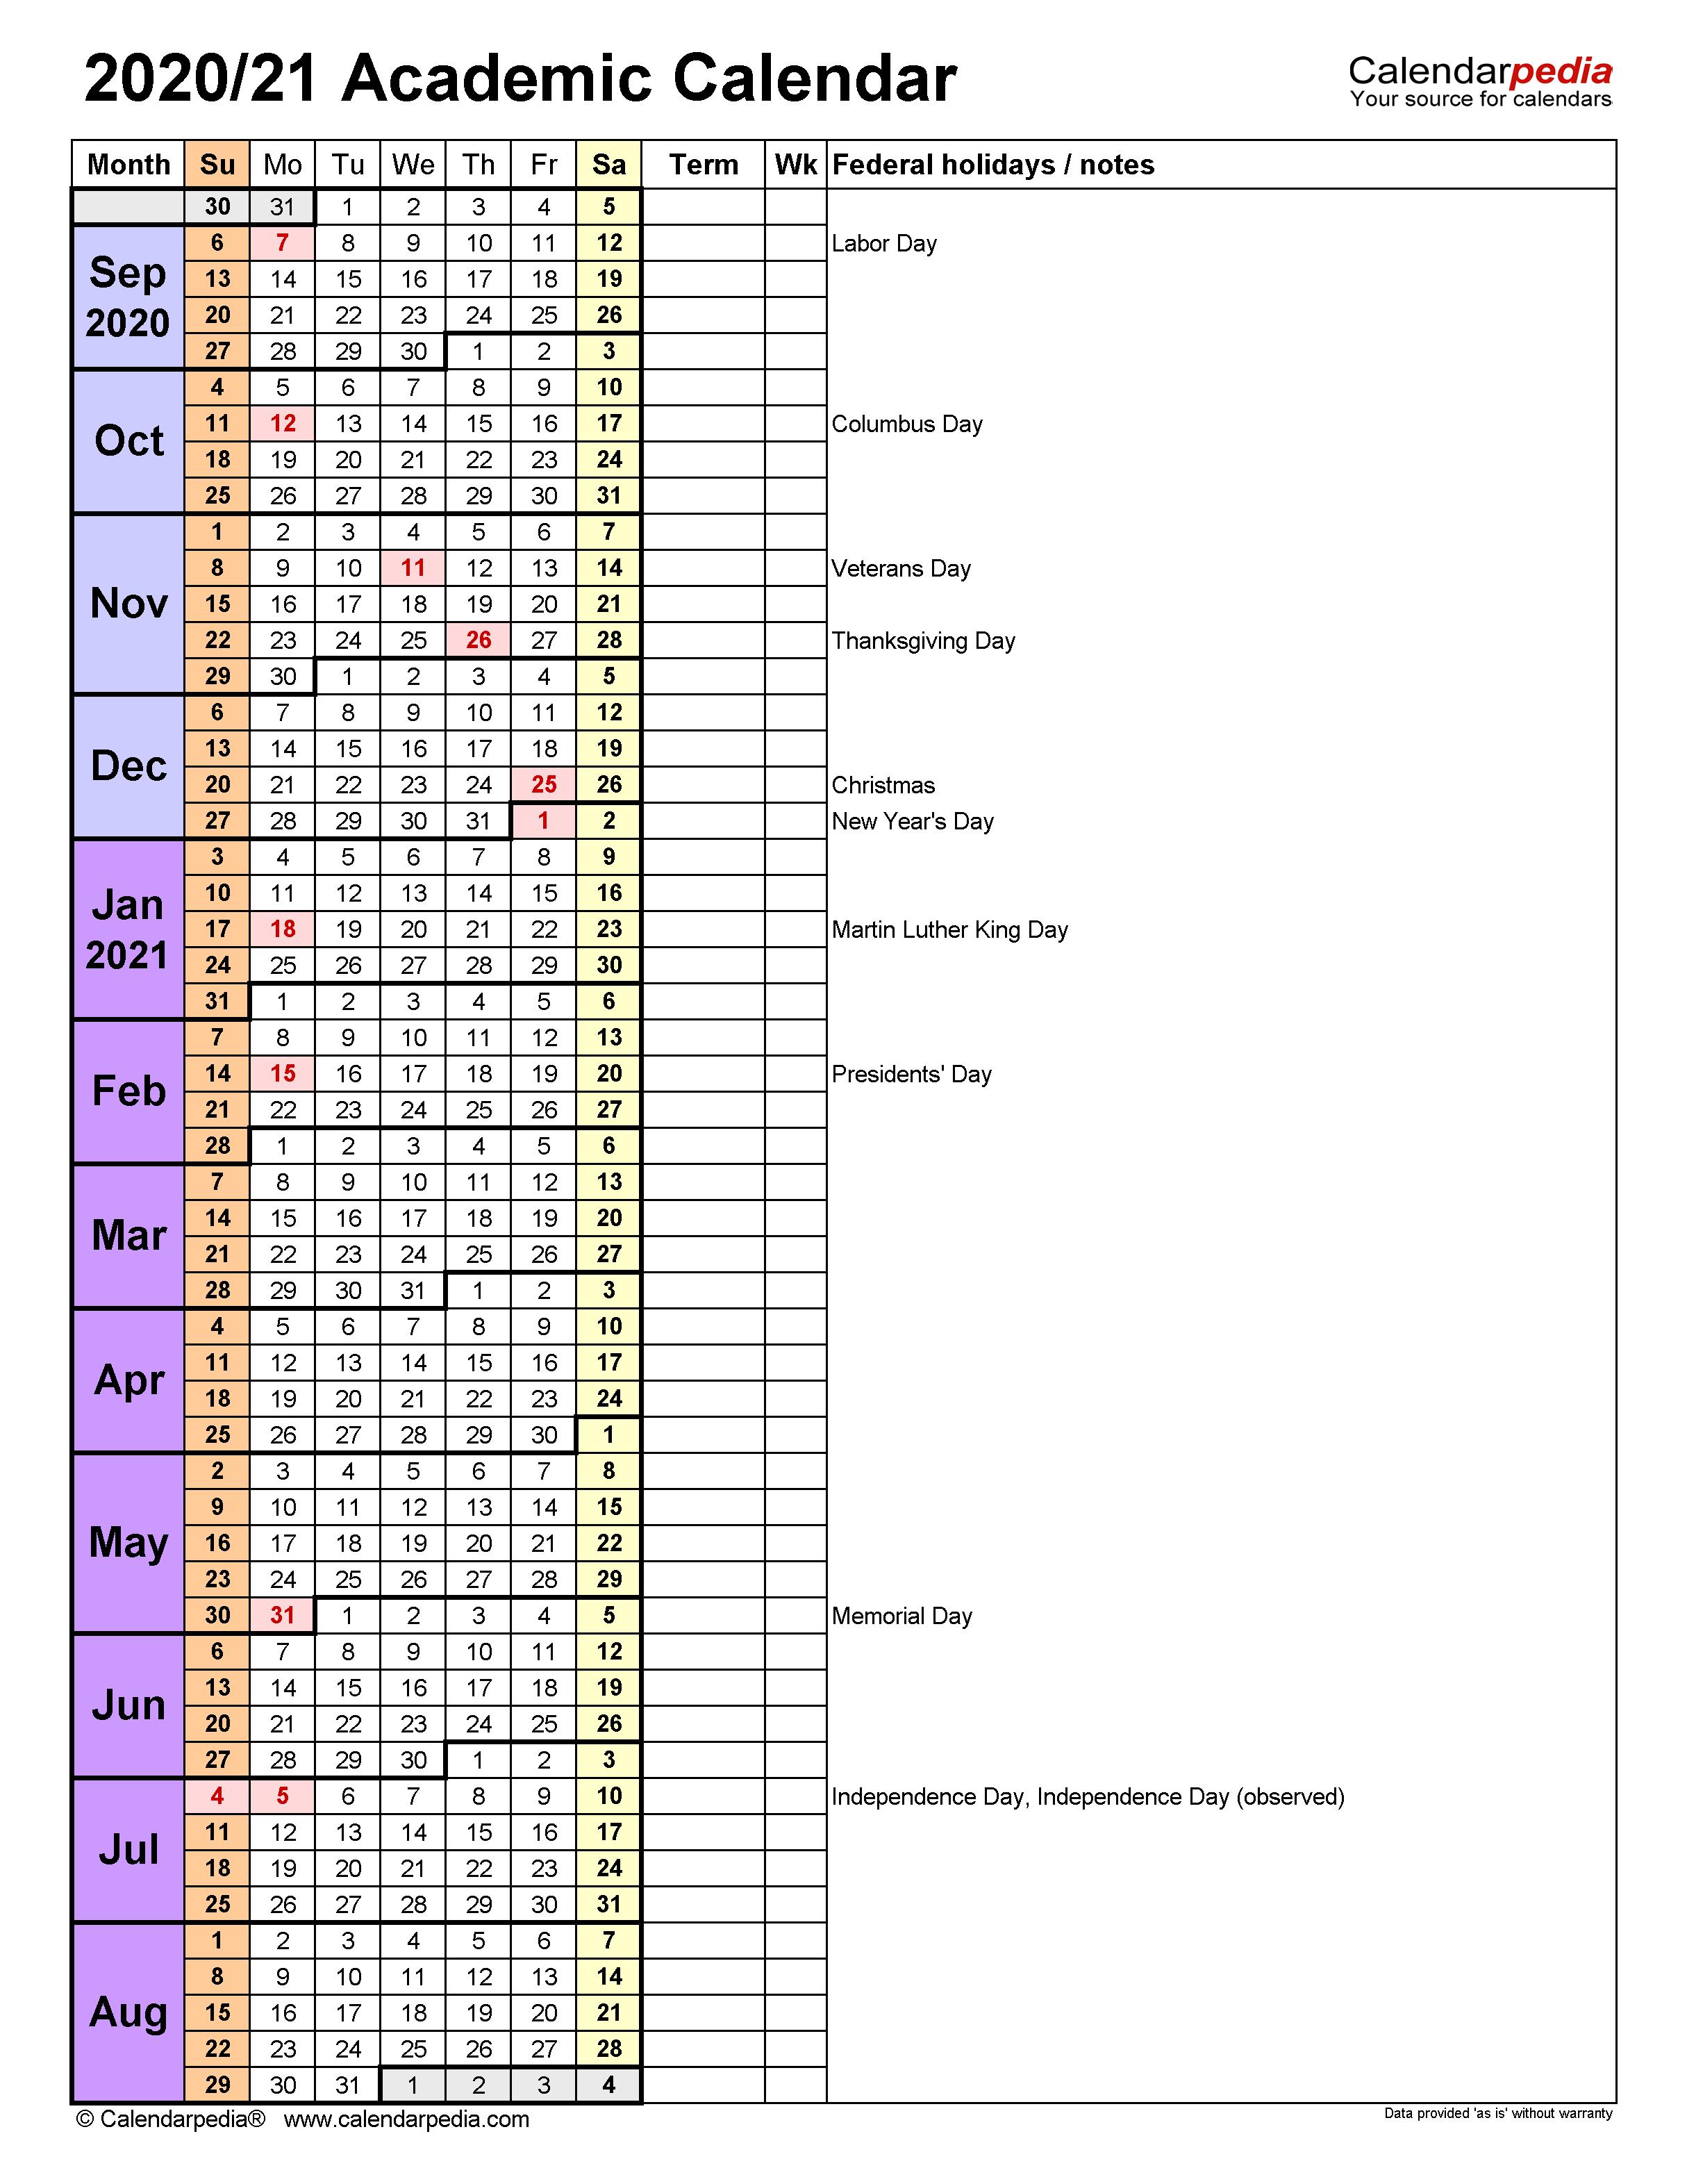 Academic Calendars 2020/2021 - Free Printable Excel Templates With Regard To Uri Academic Calendar 2021 2020